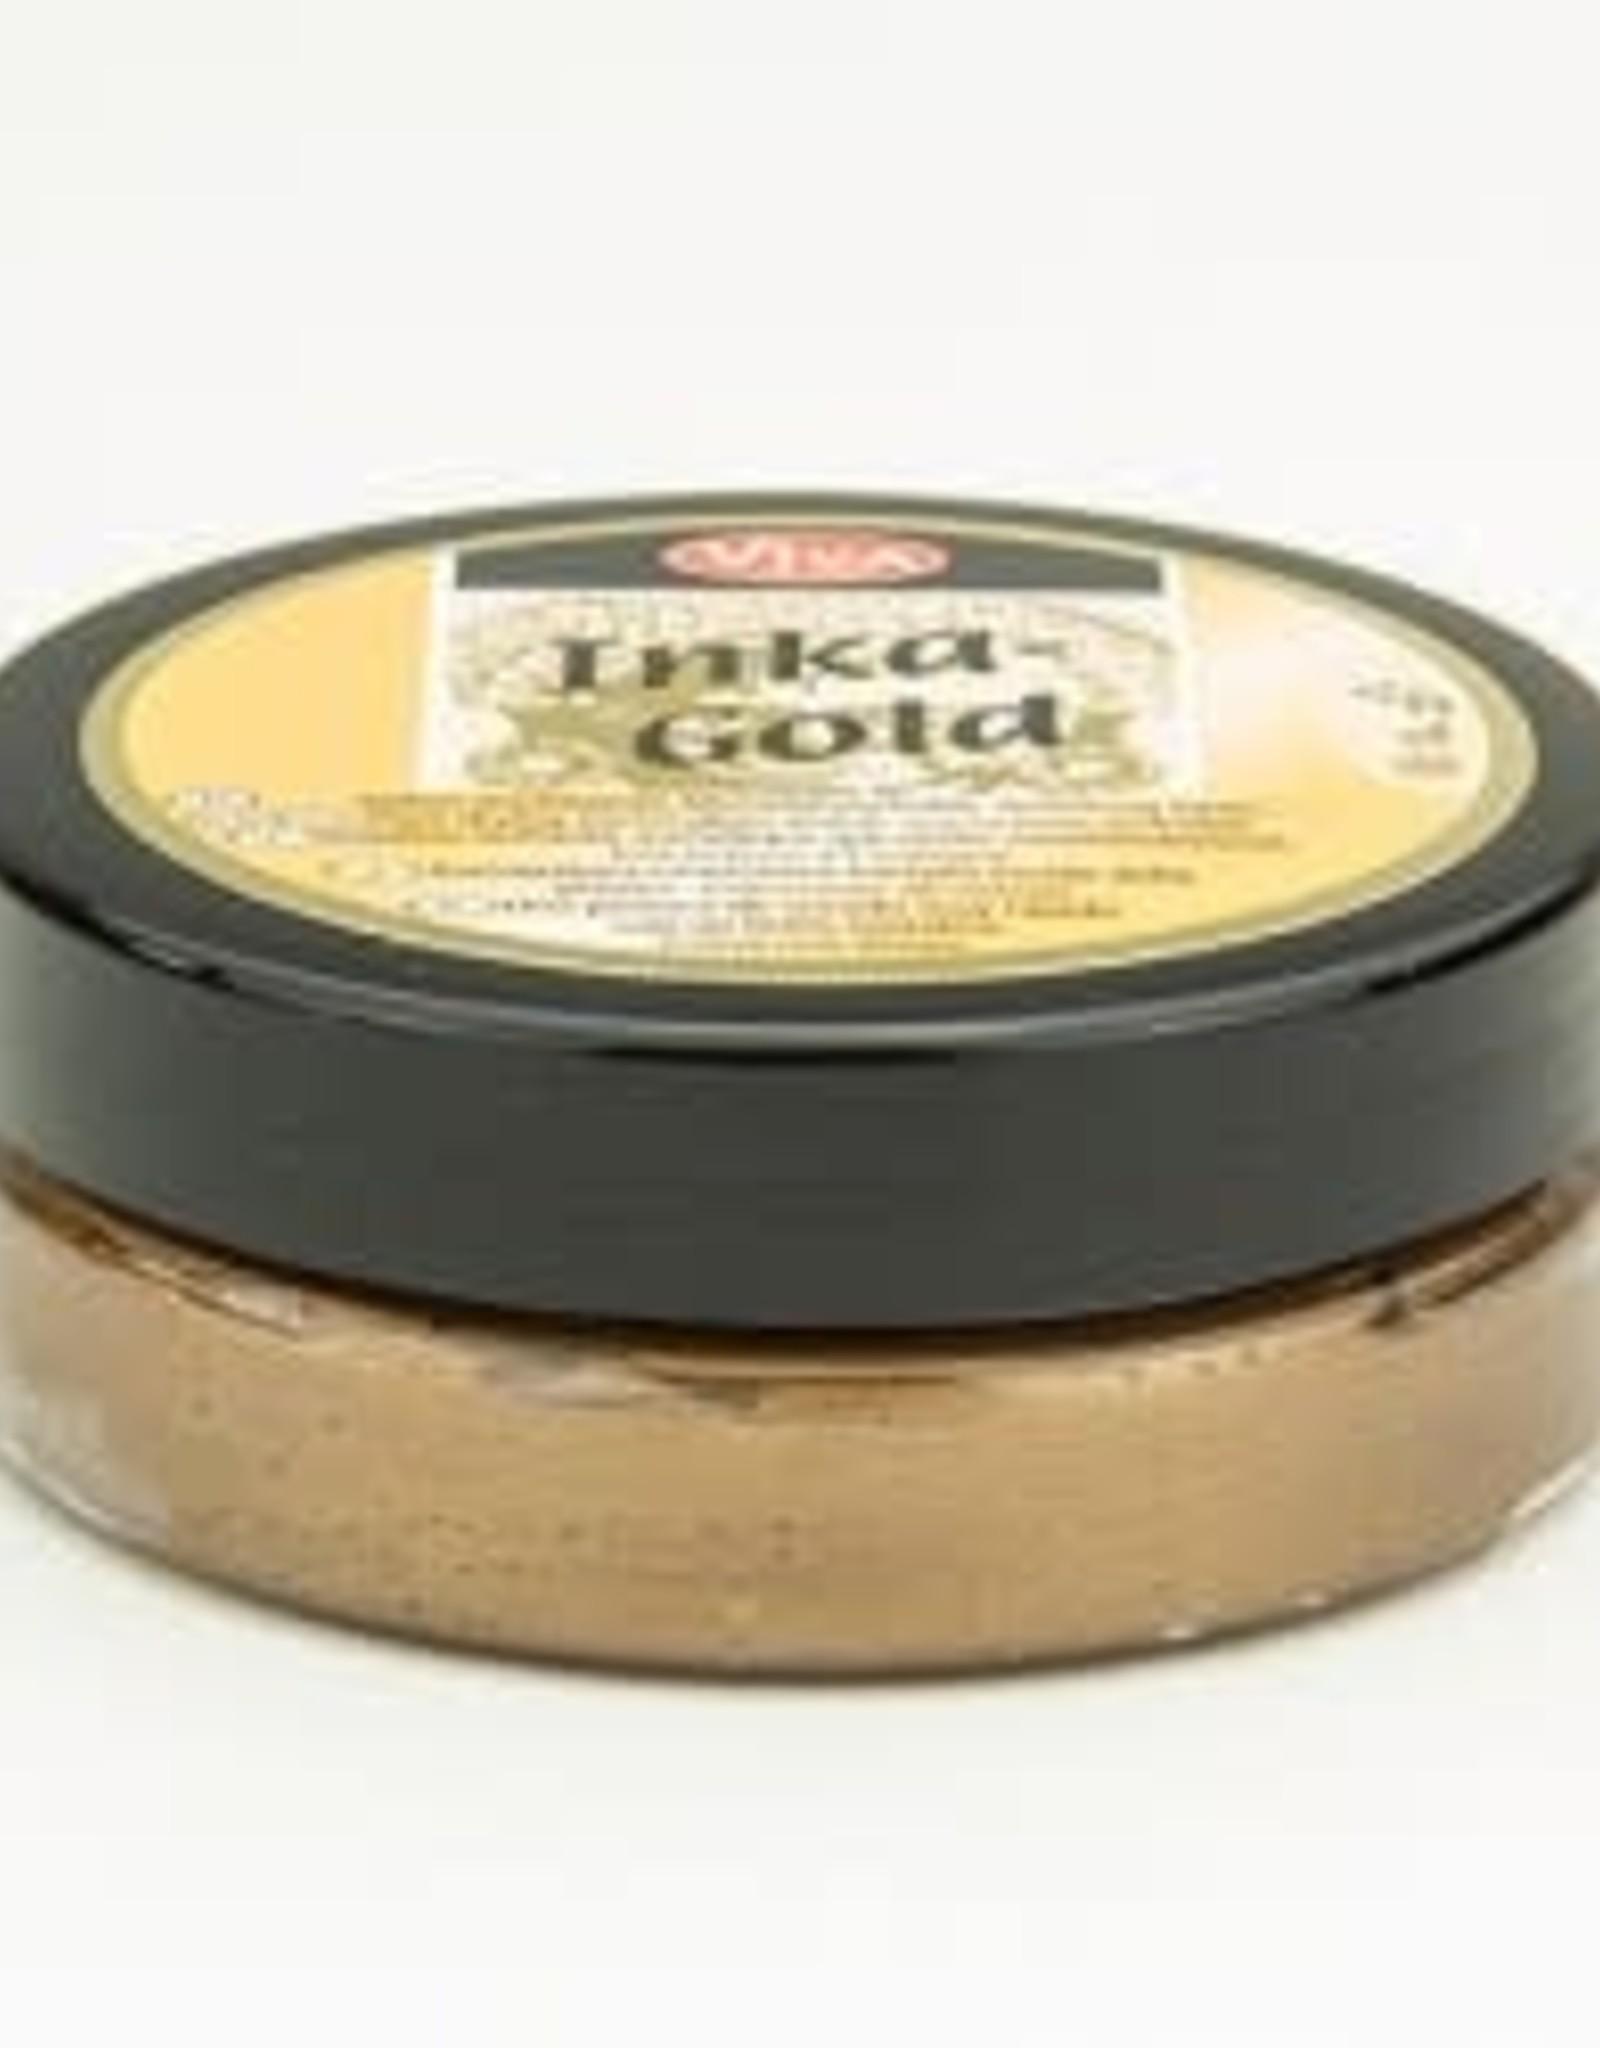 Inka-Gold Goud Bruin